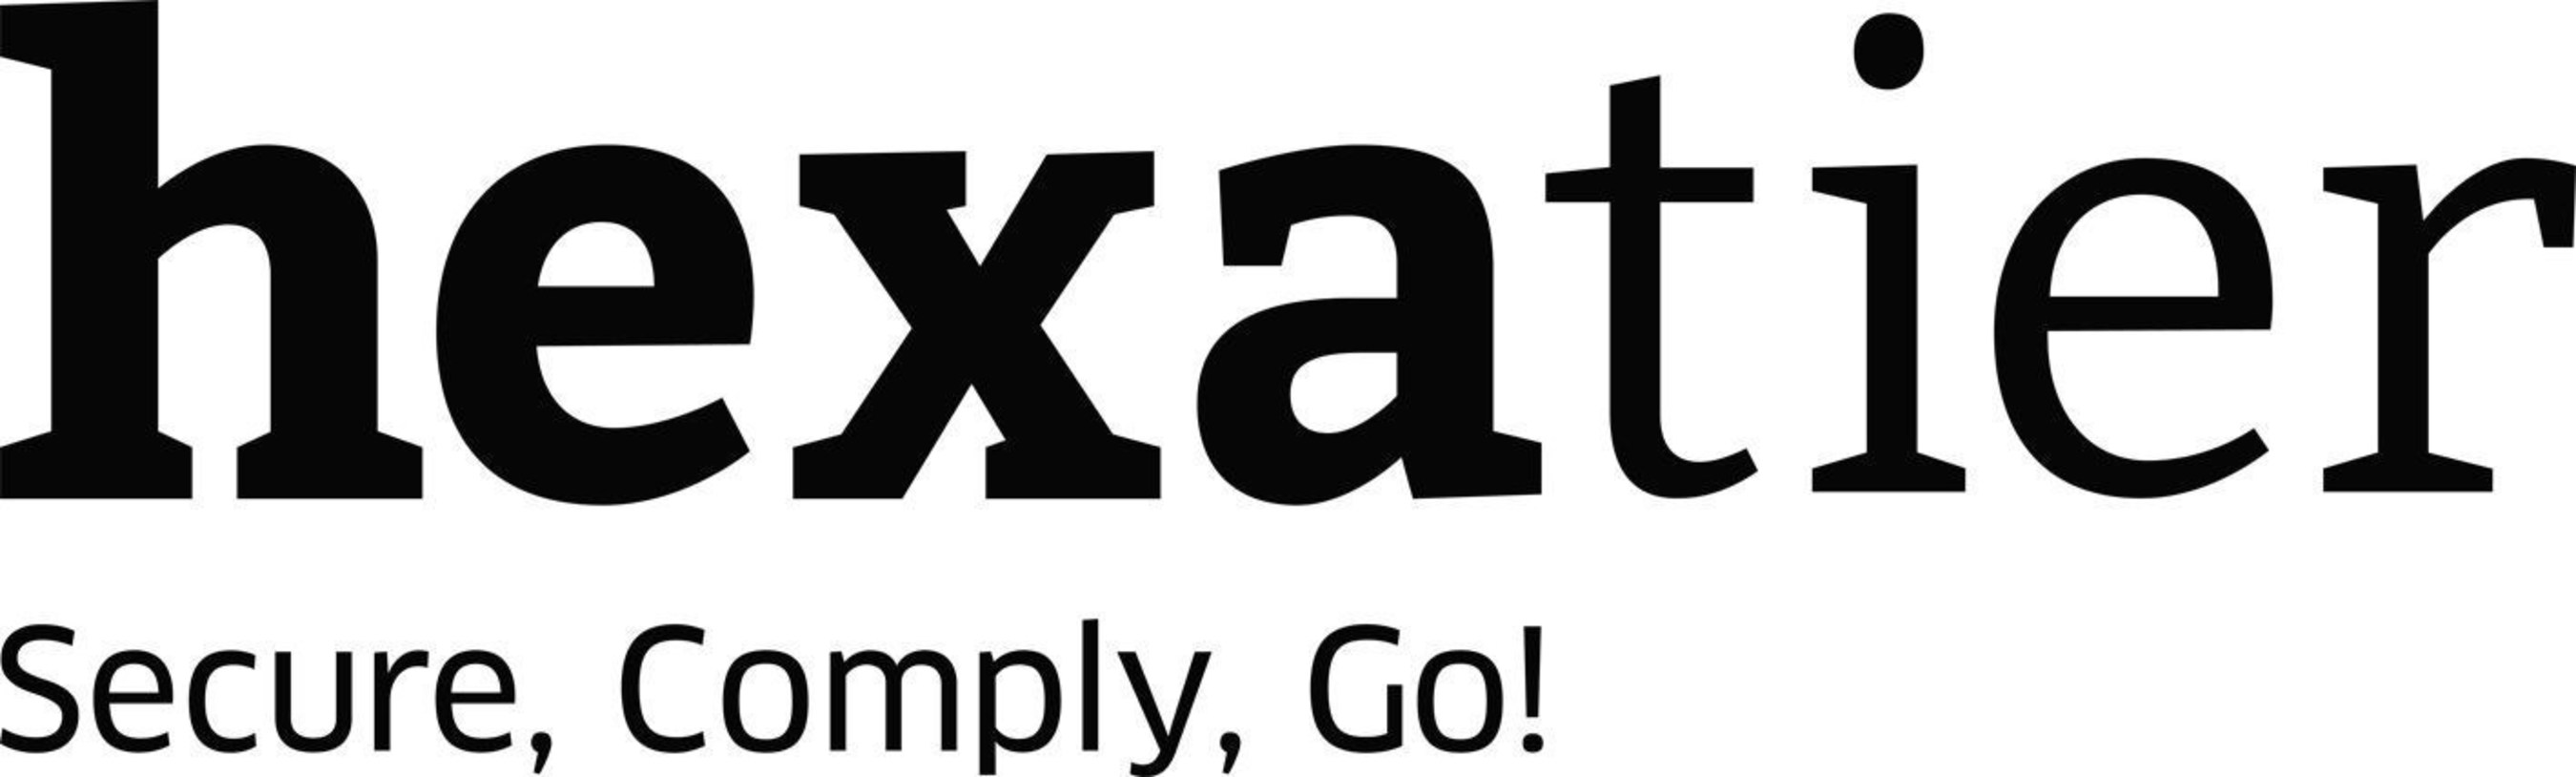 HexaTier logo (PRNewsFoto/GreenSQL) (PRNewsFoto/GreenSQL)